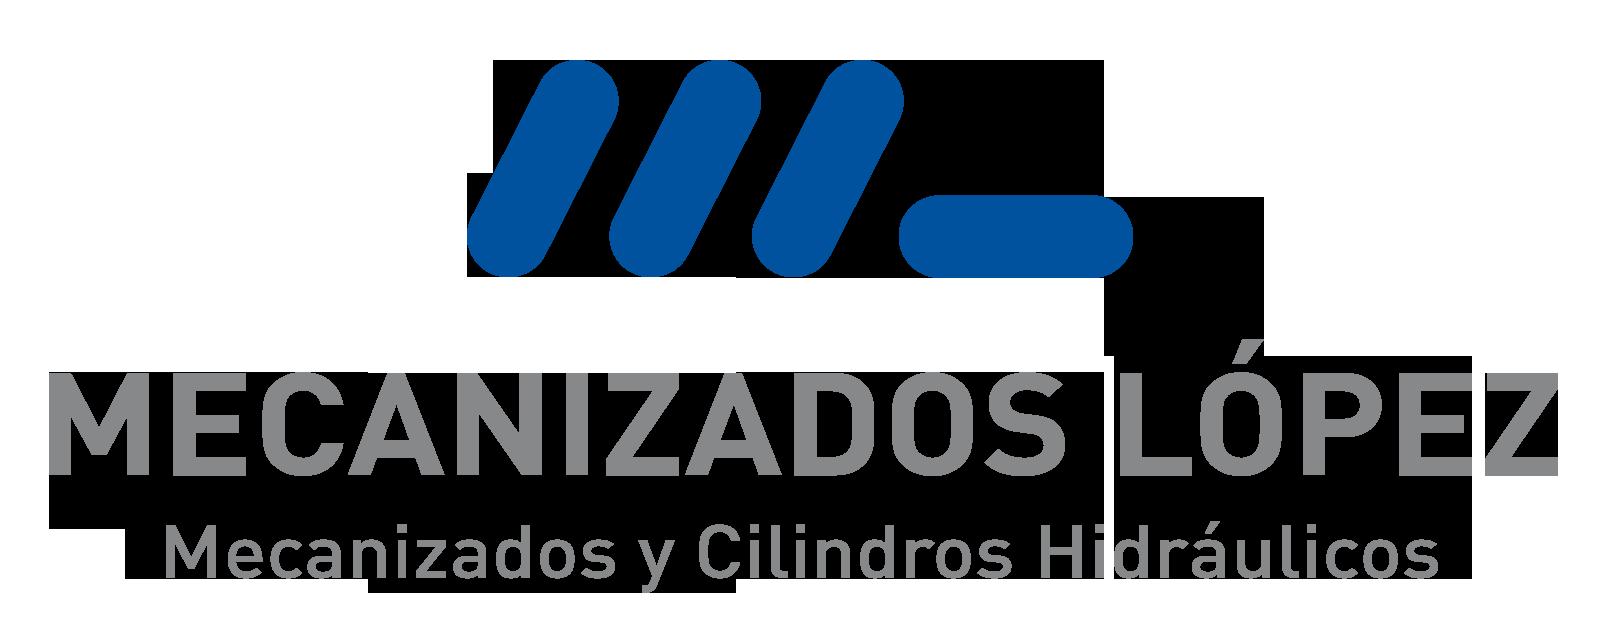 Mecanizados López